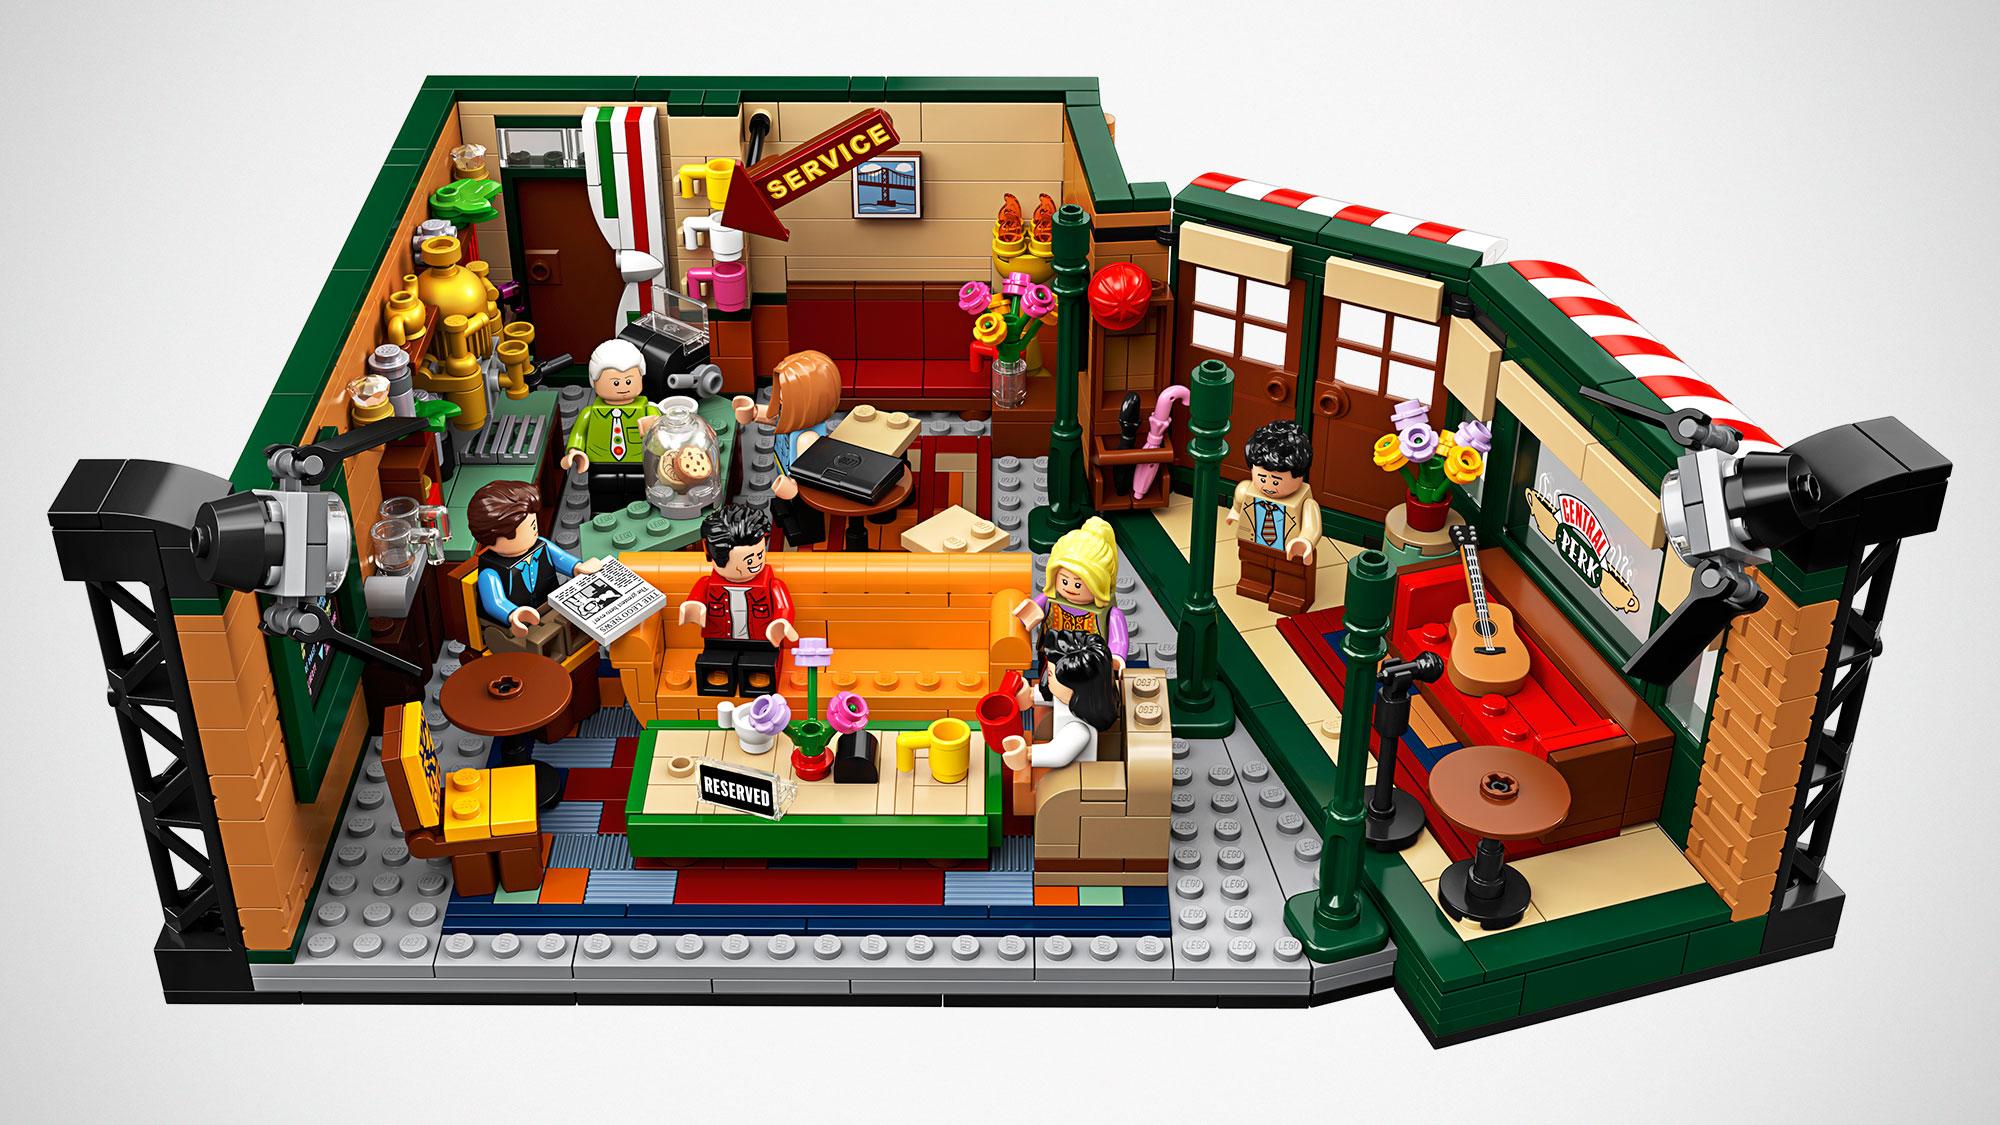 LEGO Ideas Central Perk Based On NBC Sitcom Friends Will ...